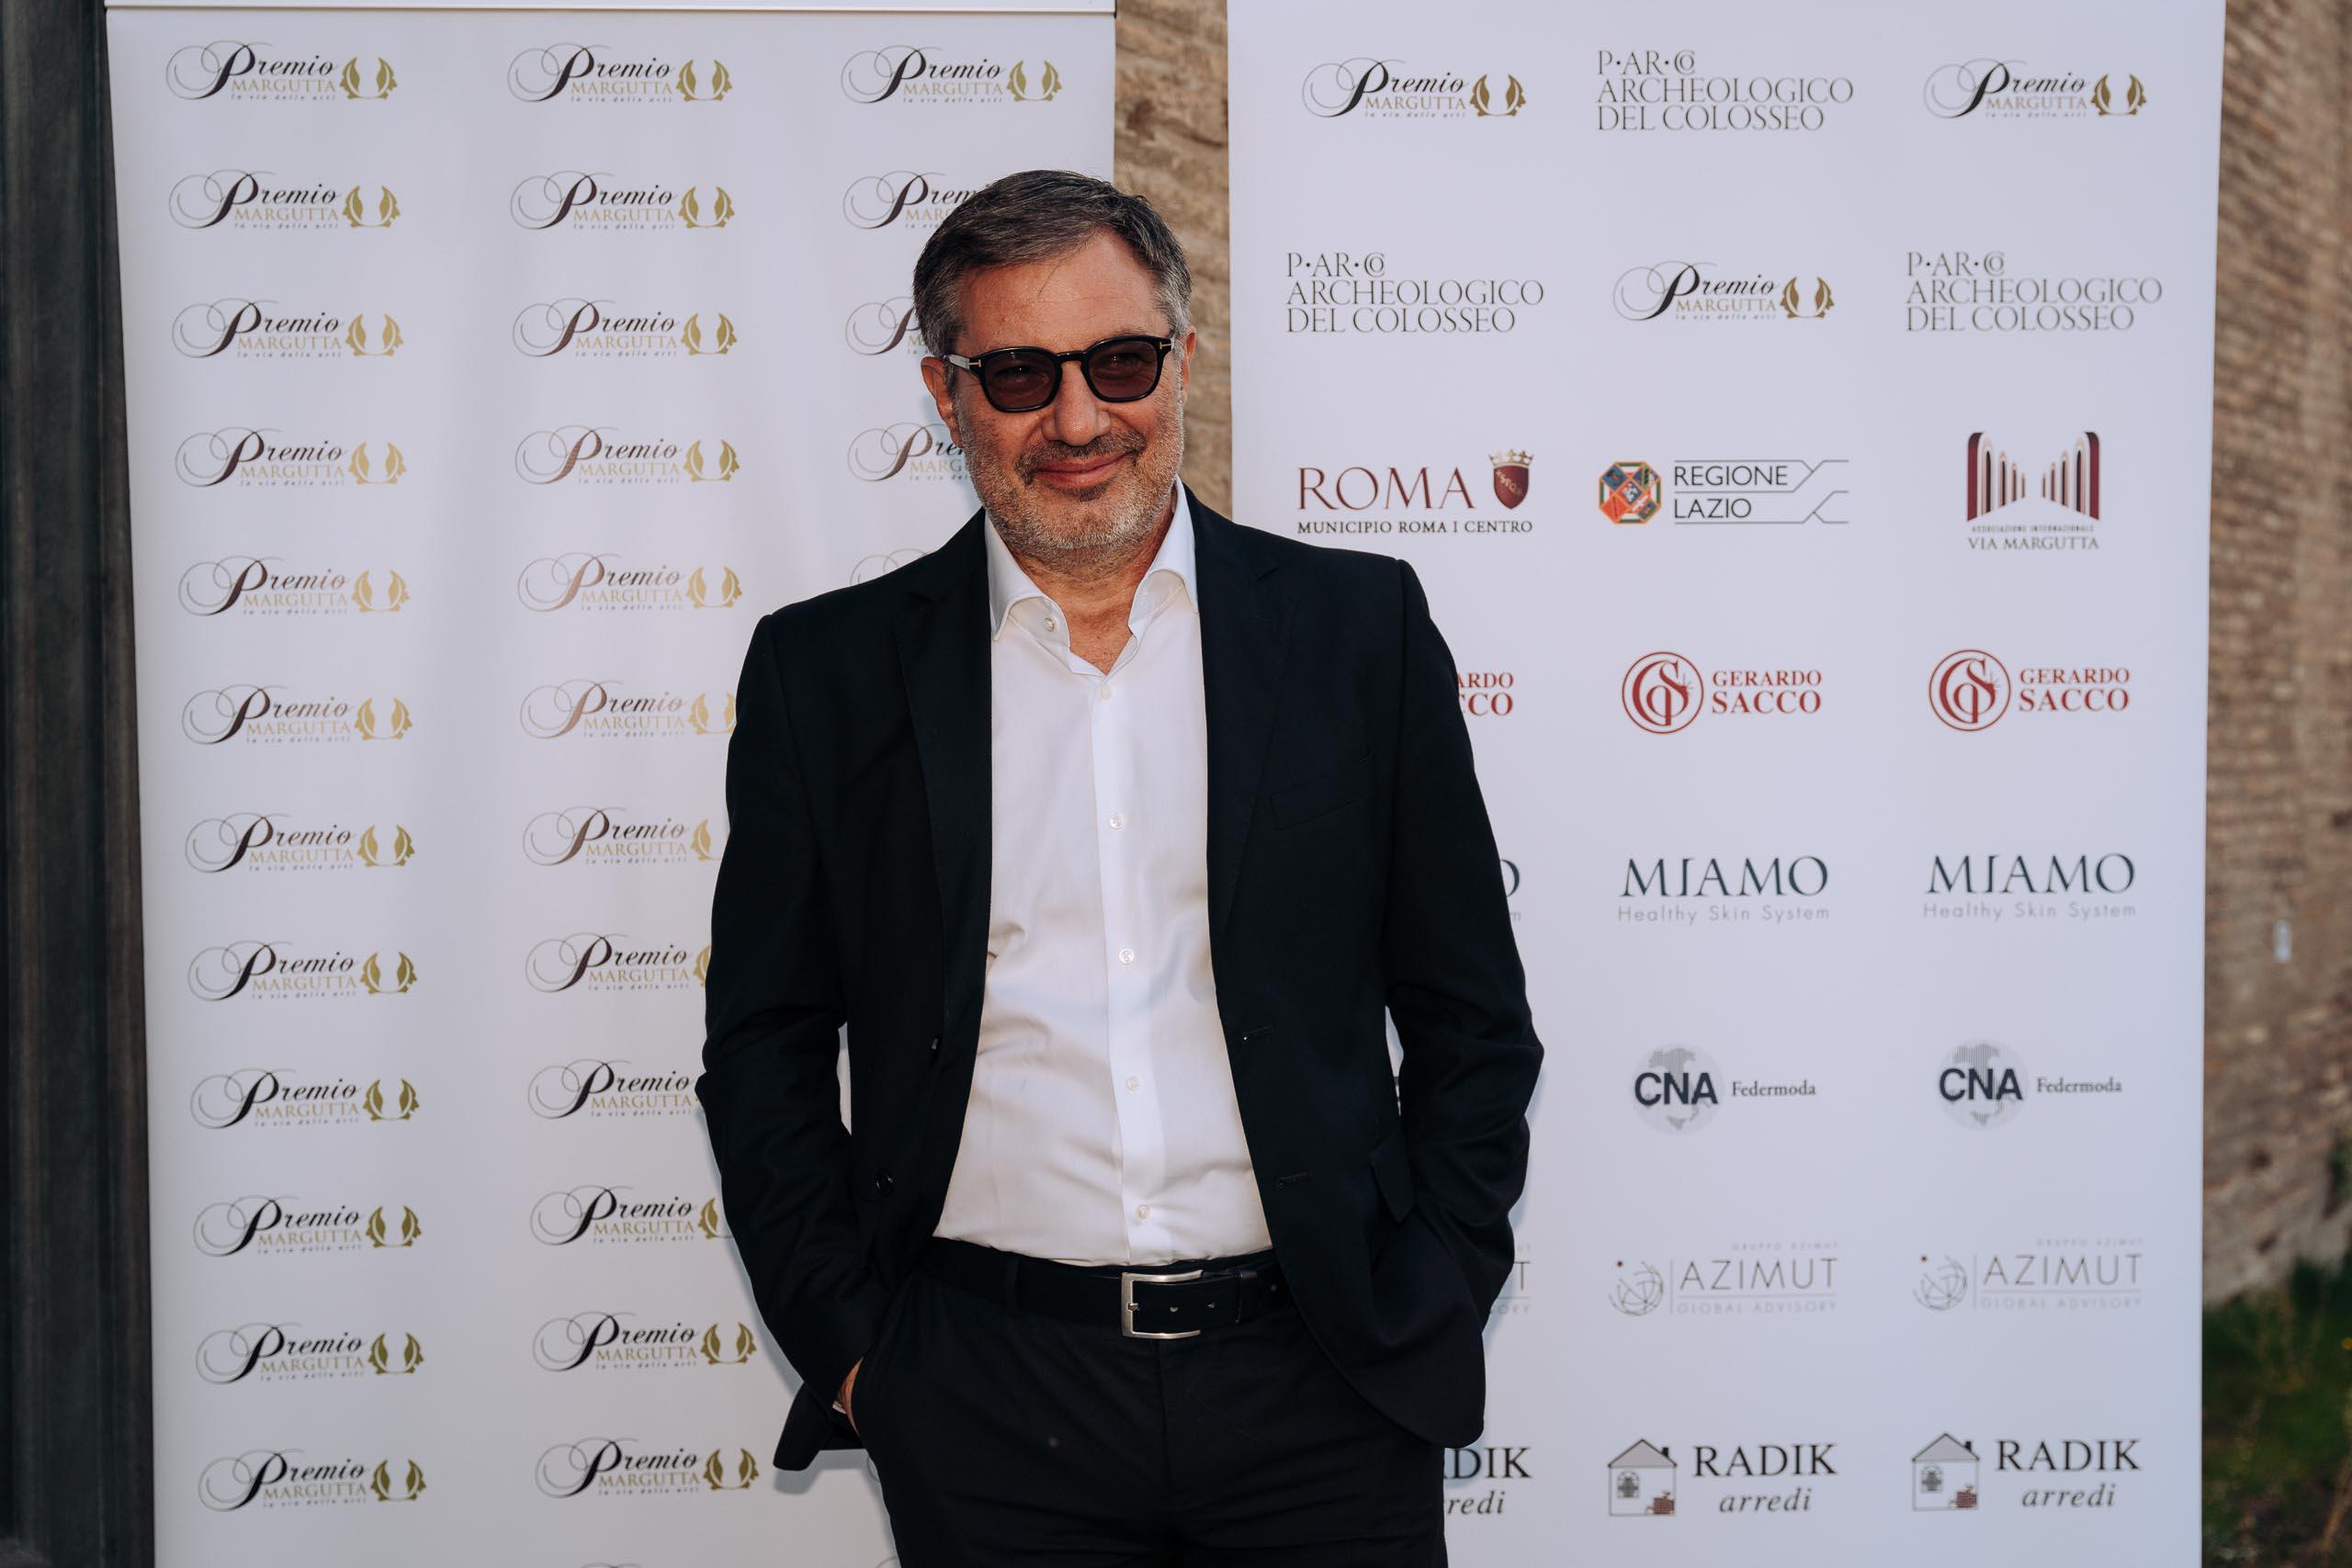 16 Alessandro Raffaelli